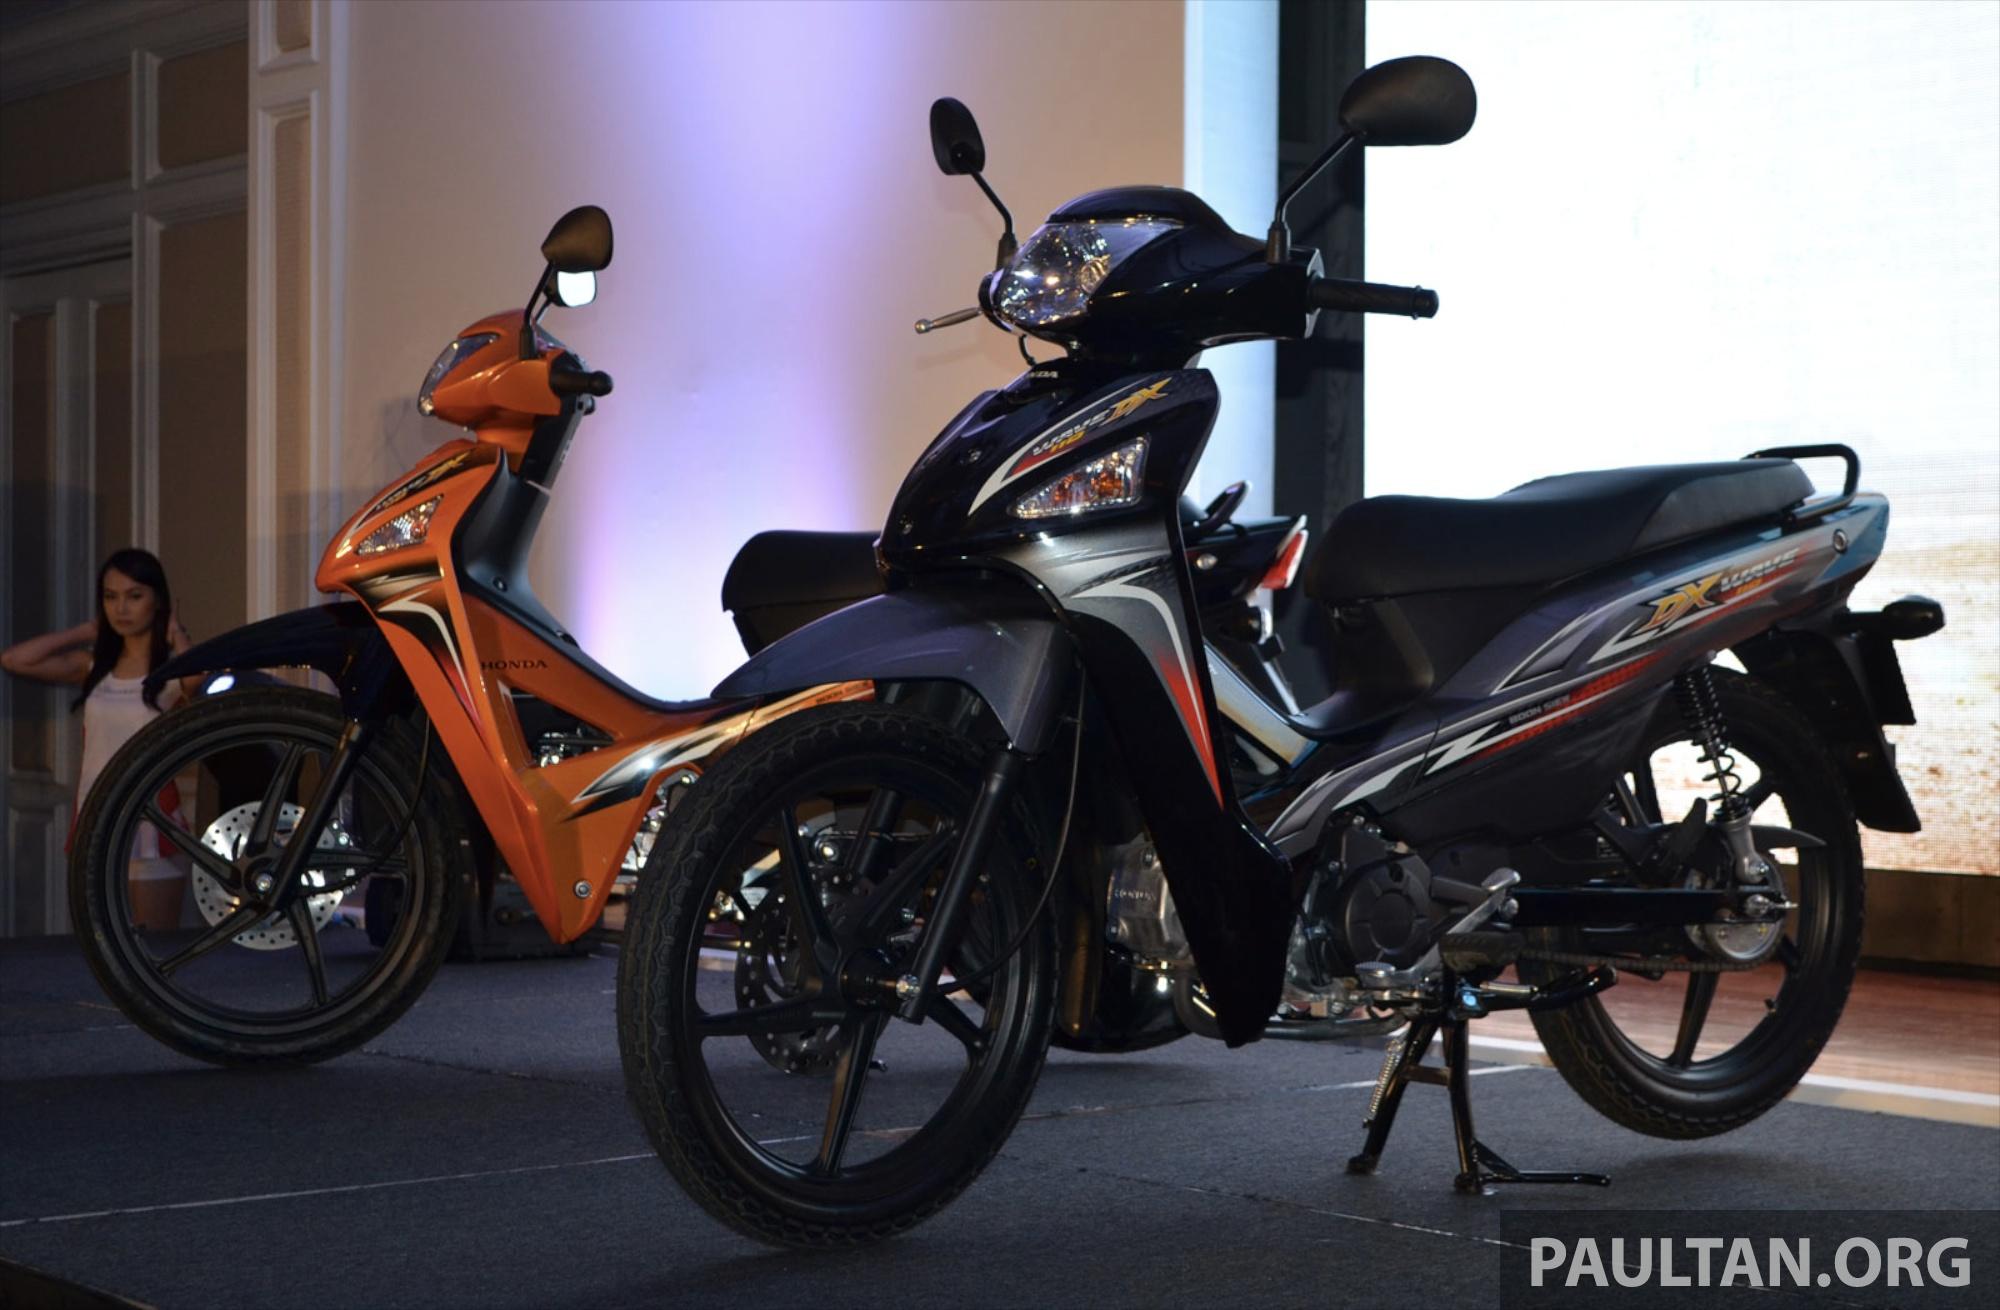 New Honda Wave 110 Kapcai Launched By Boon Siew Paul Tan